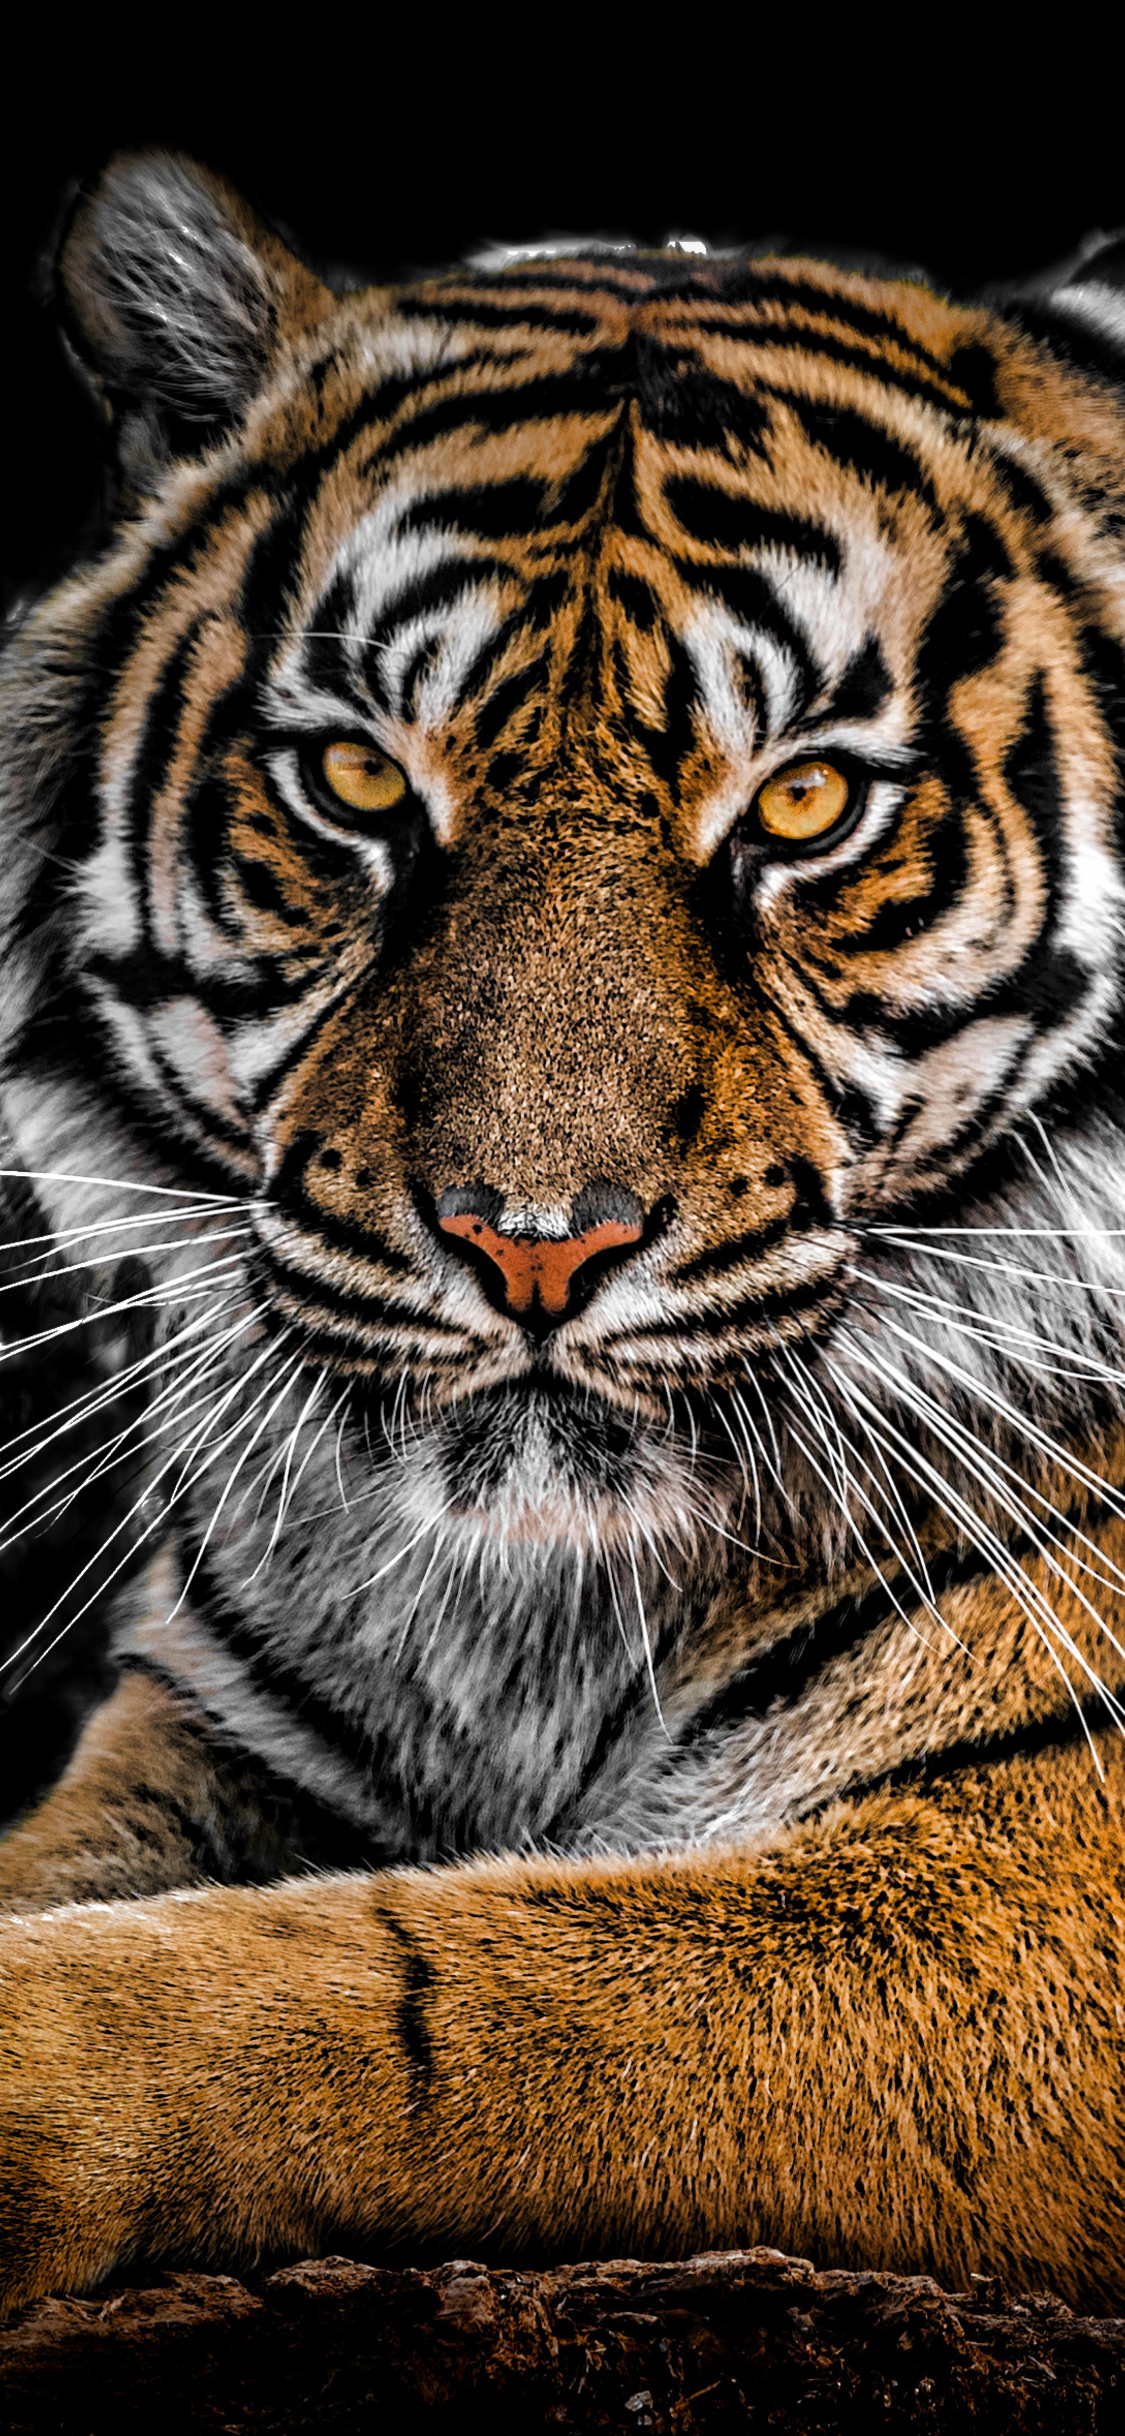 1125x2436 Tiger Closeup Iphone XS,Iphone 10,Iphone X HD 4k